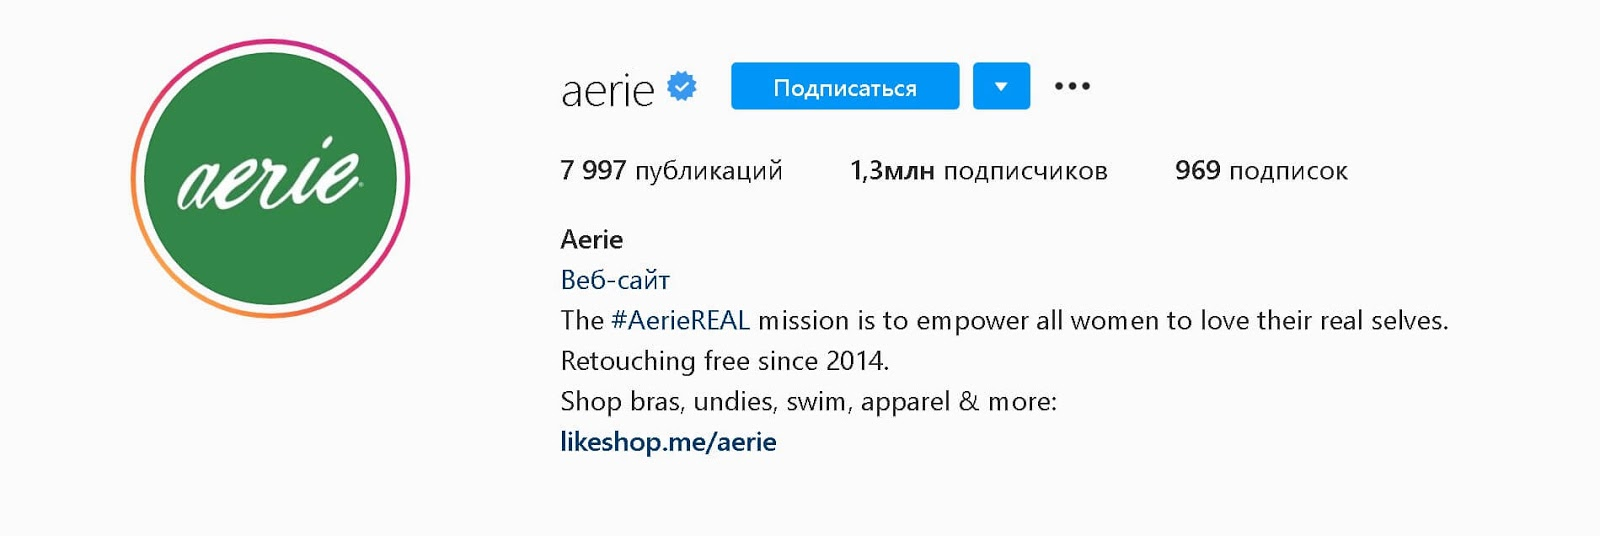 instagram-bios-aerie